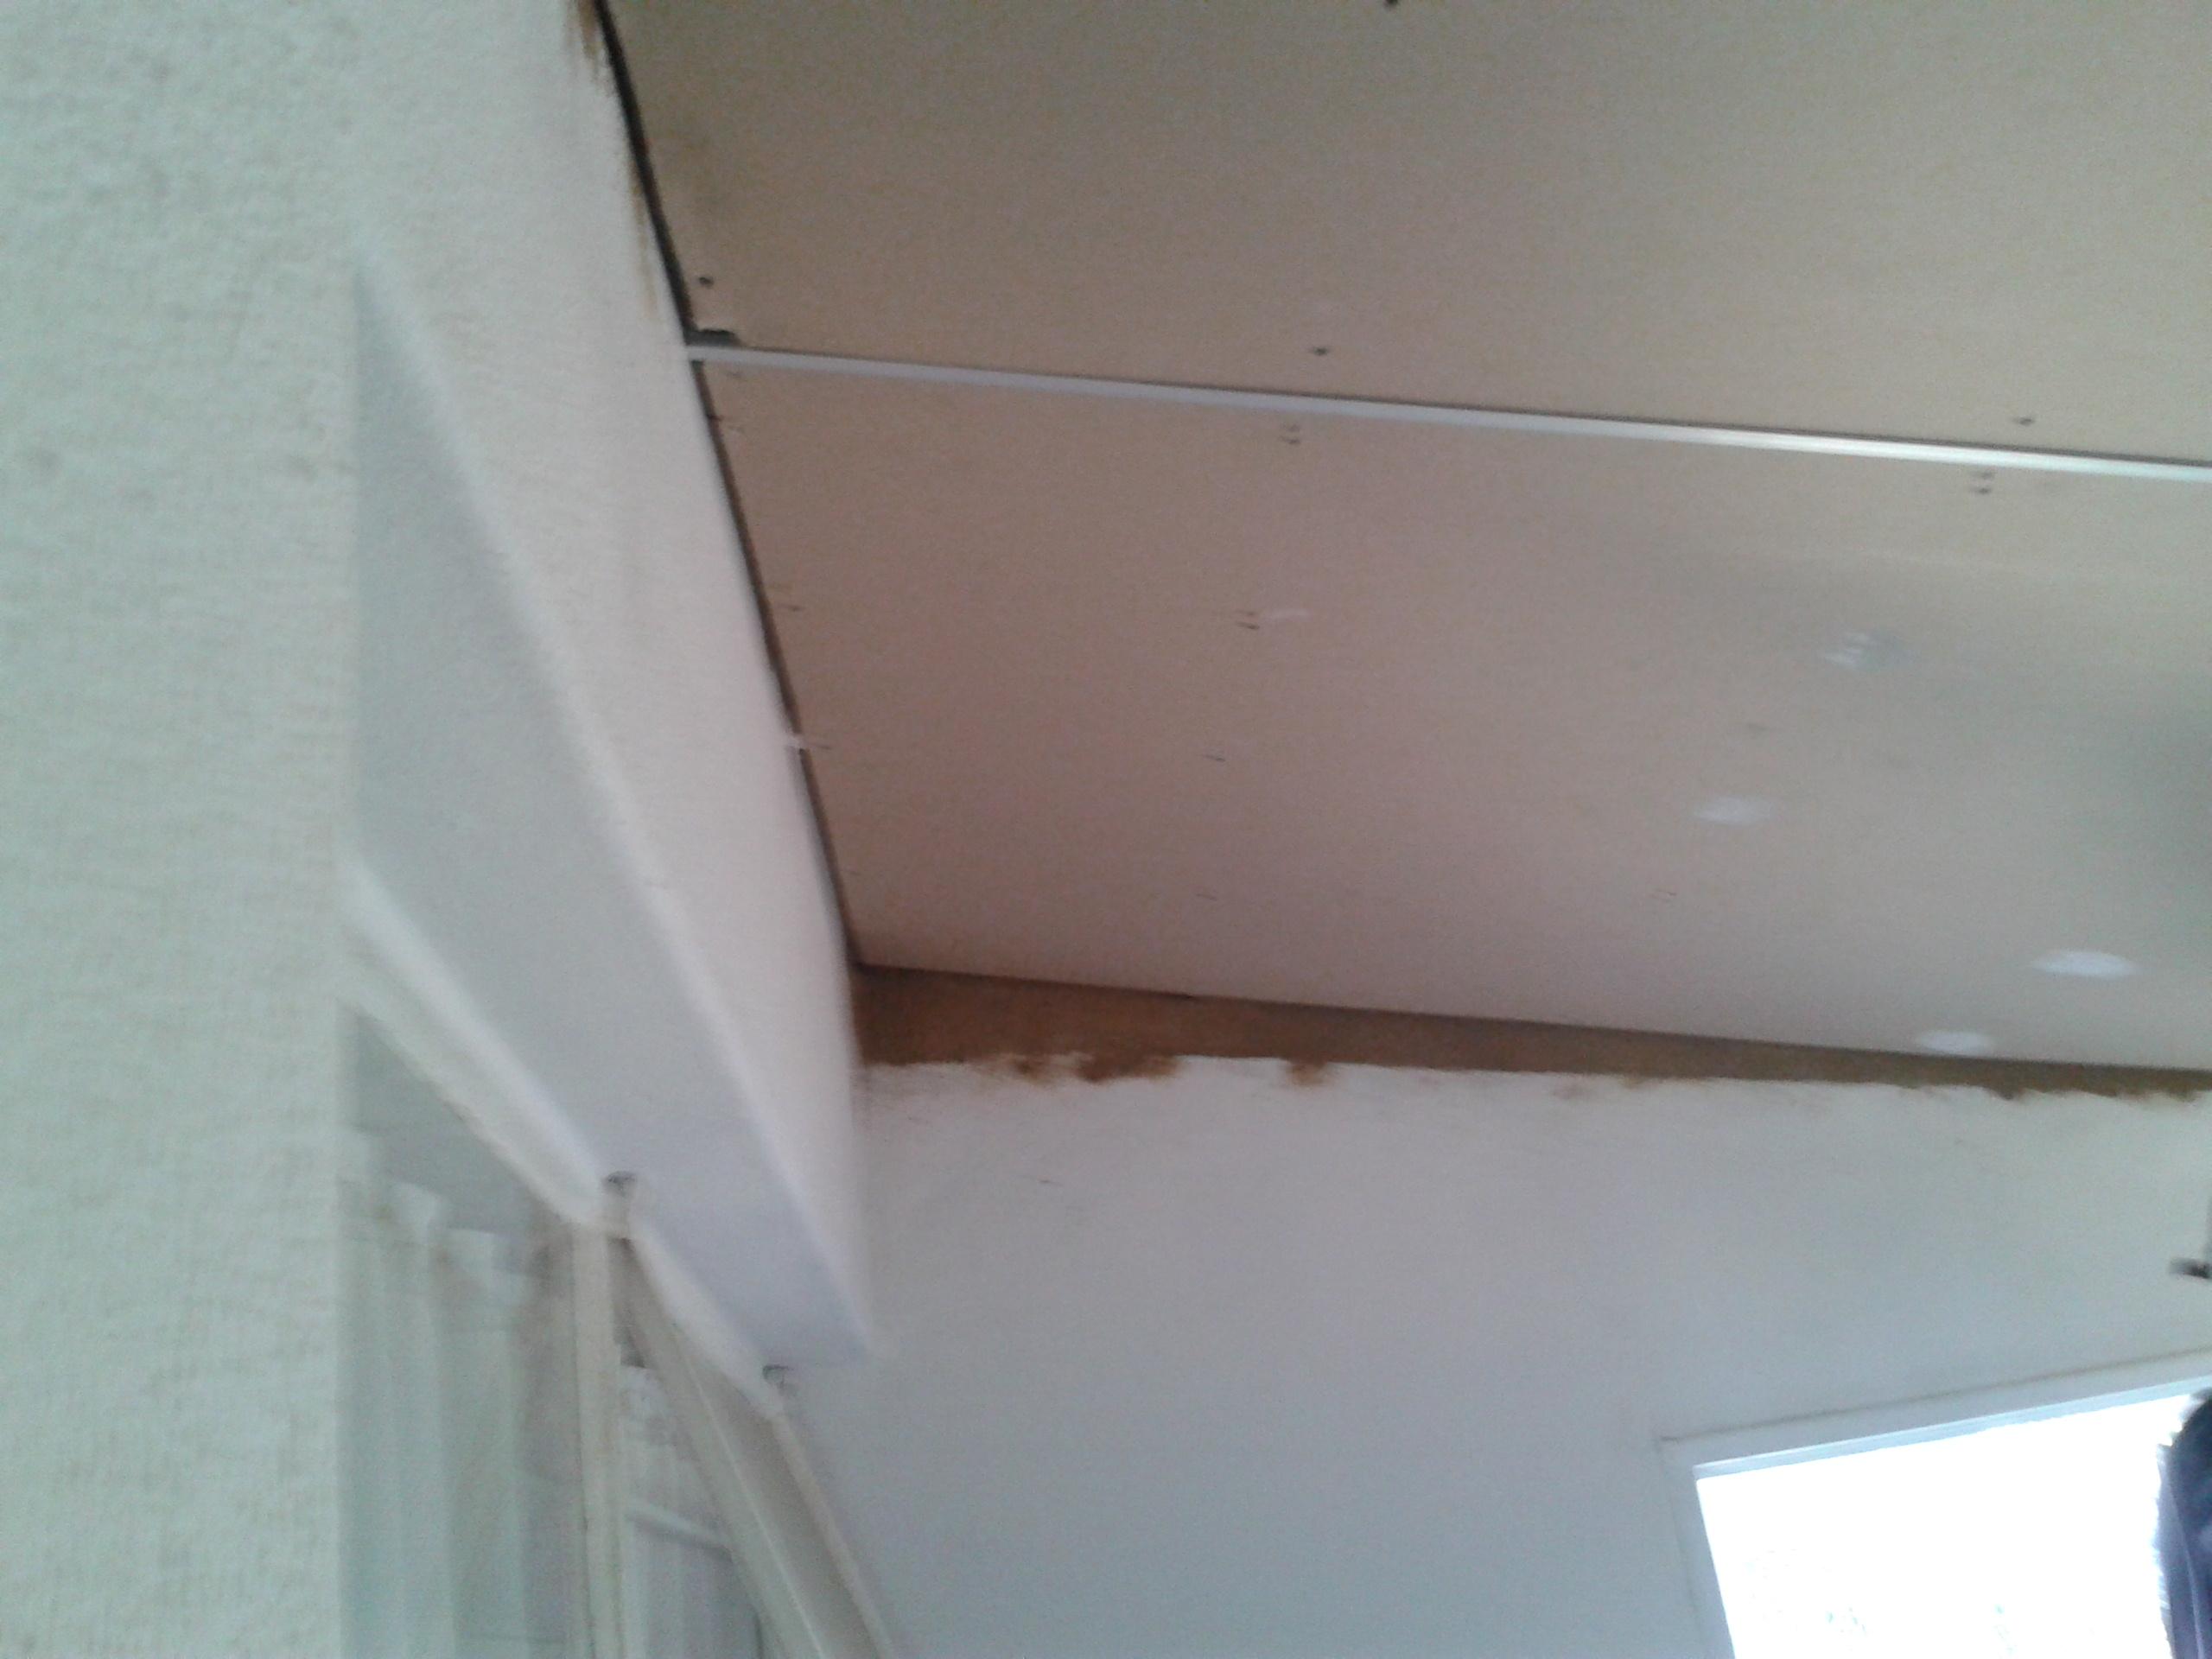 Ceilings resident 6 – preparation